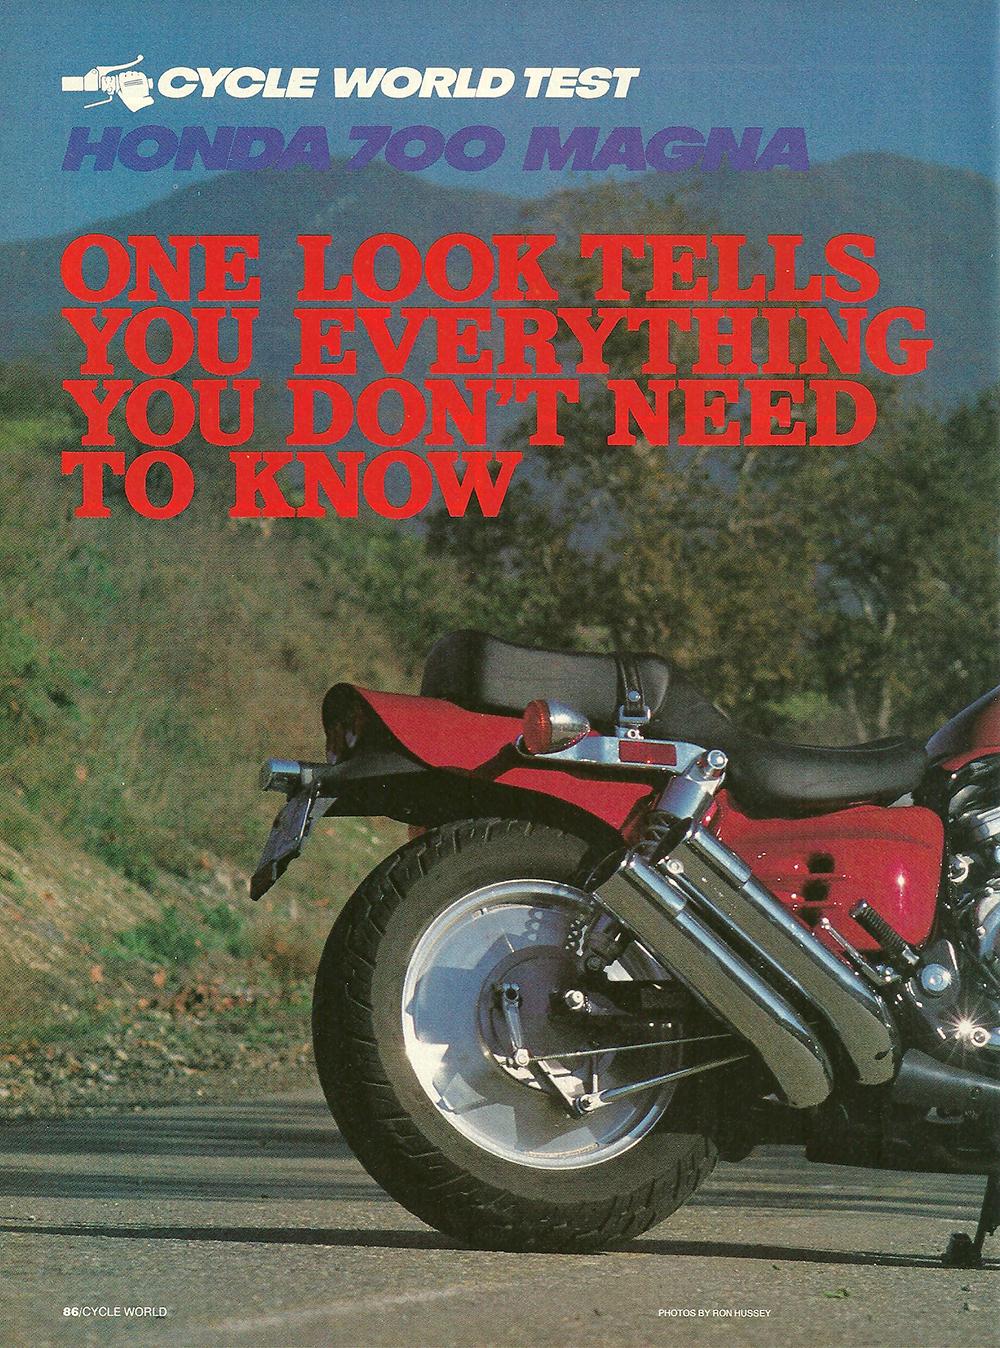 1987 Honda 700 Magna road test 01.jpg